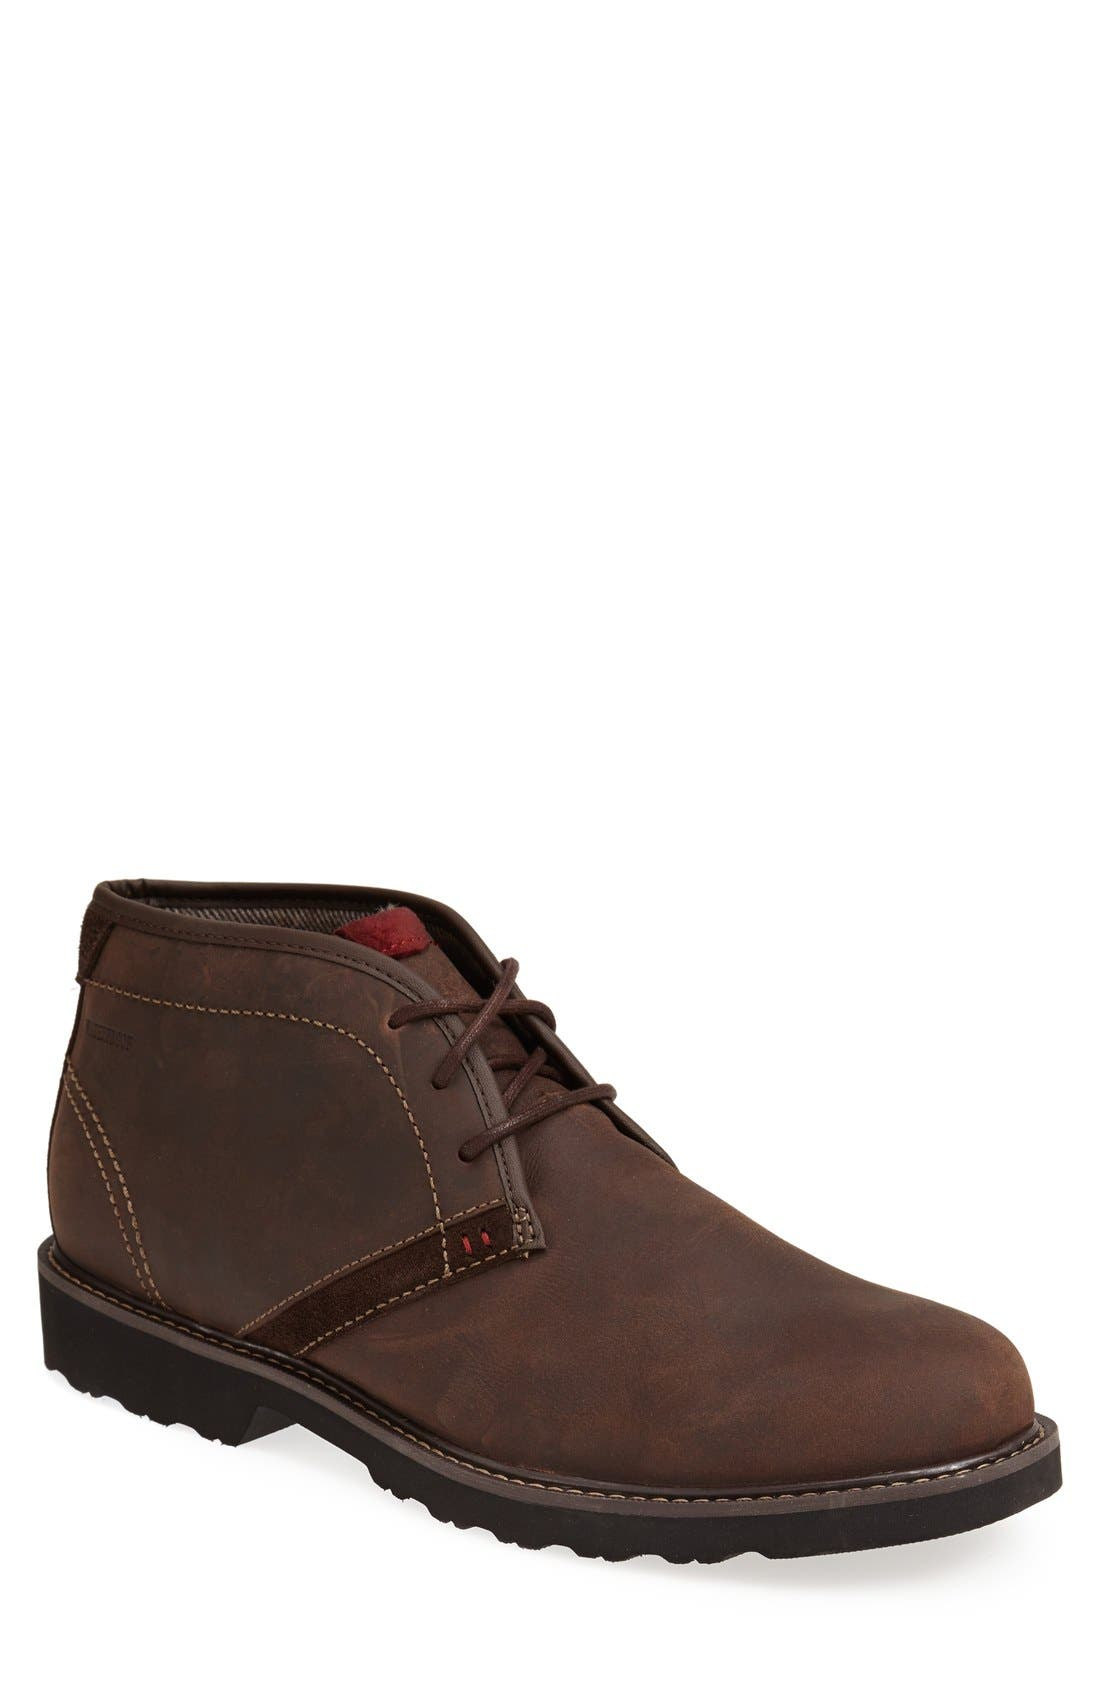 'REVdash' Chukka Boot,                         Main,                         color, Brown